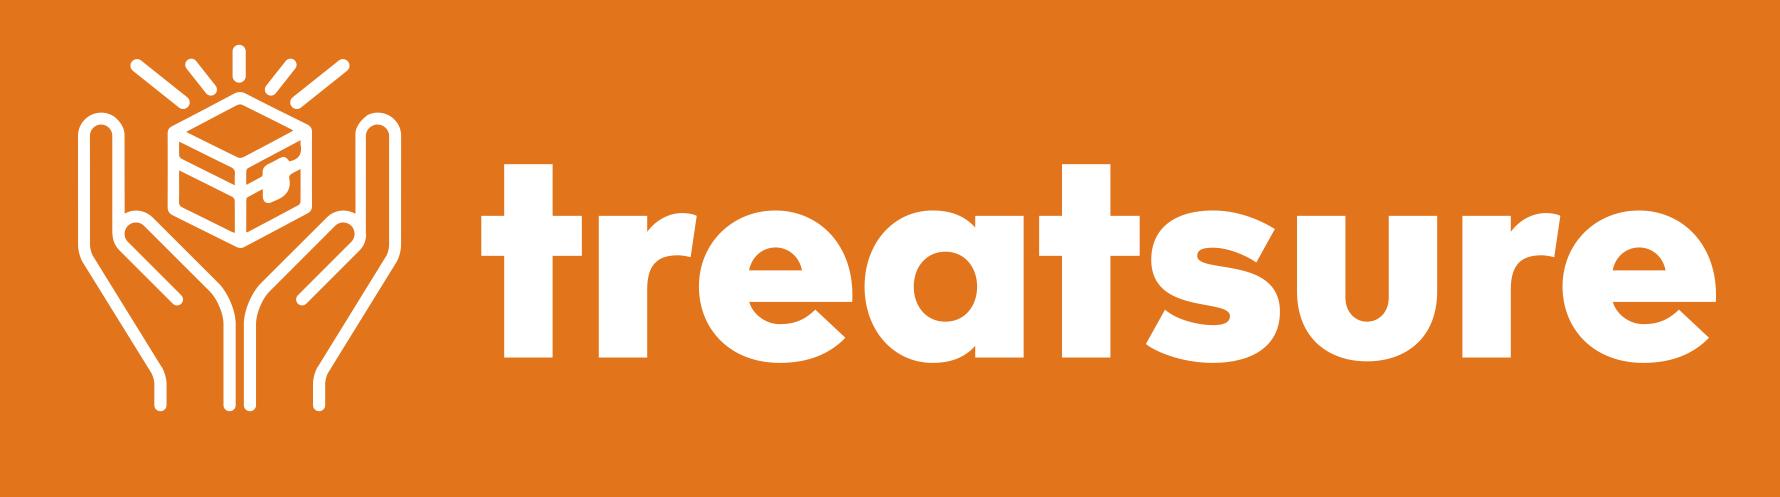 Treatsure(orange bg).png